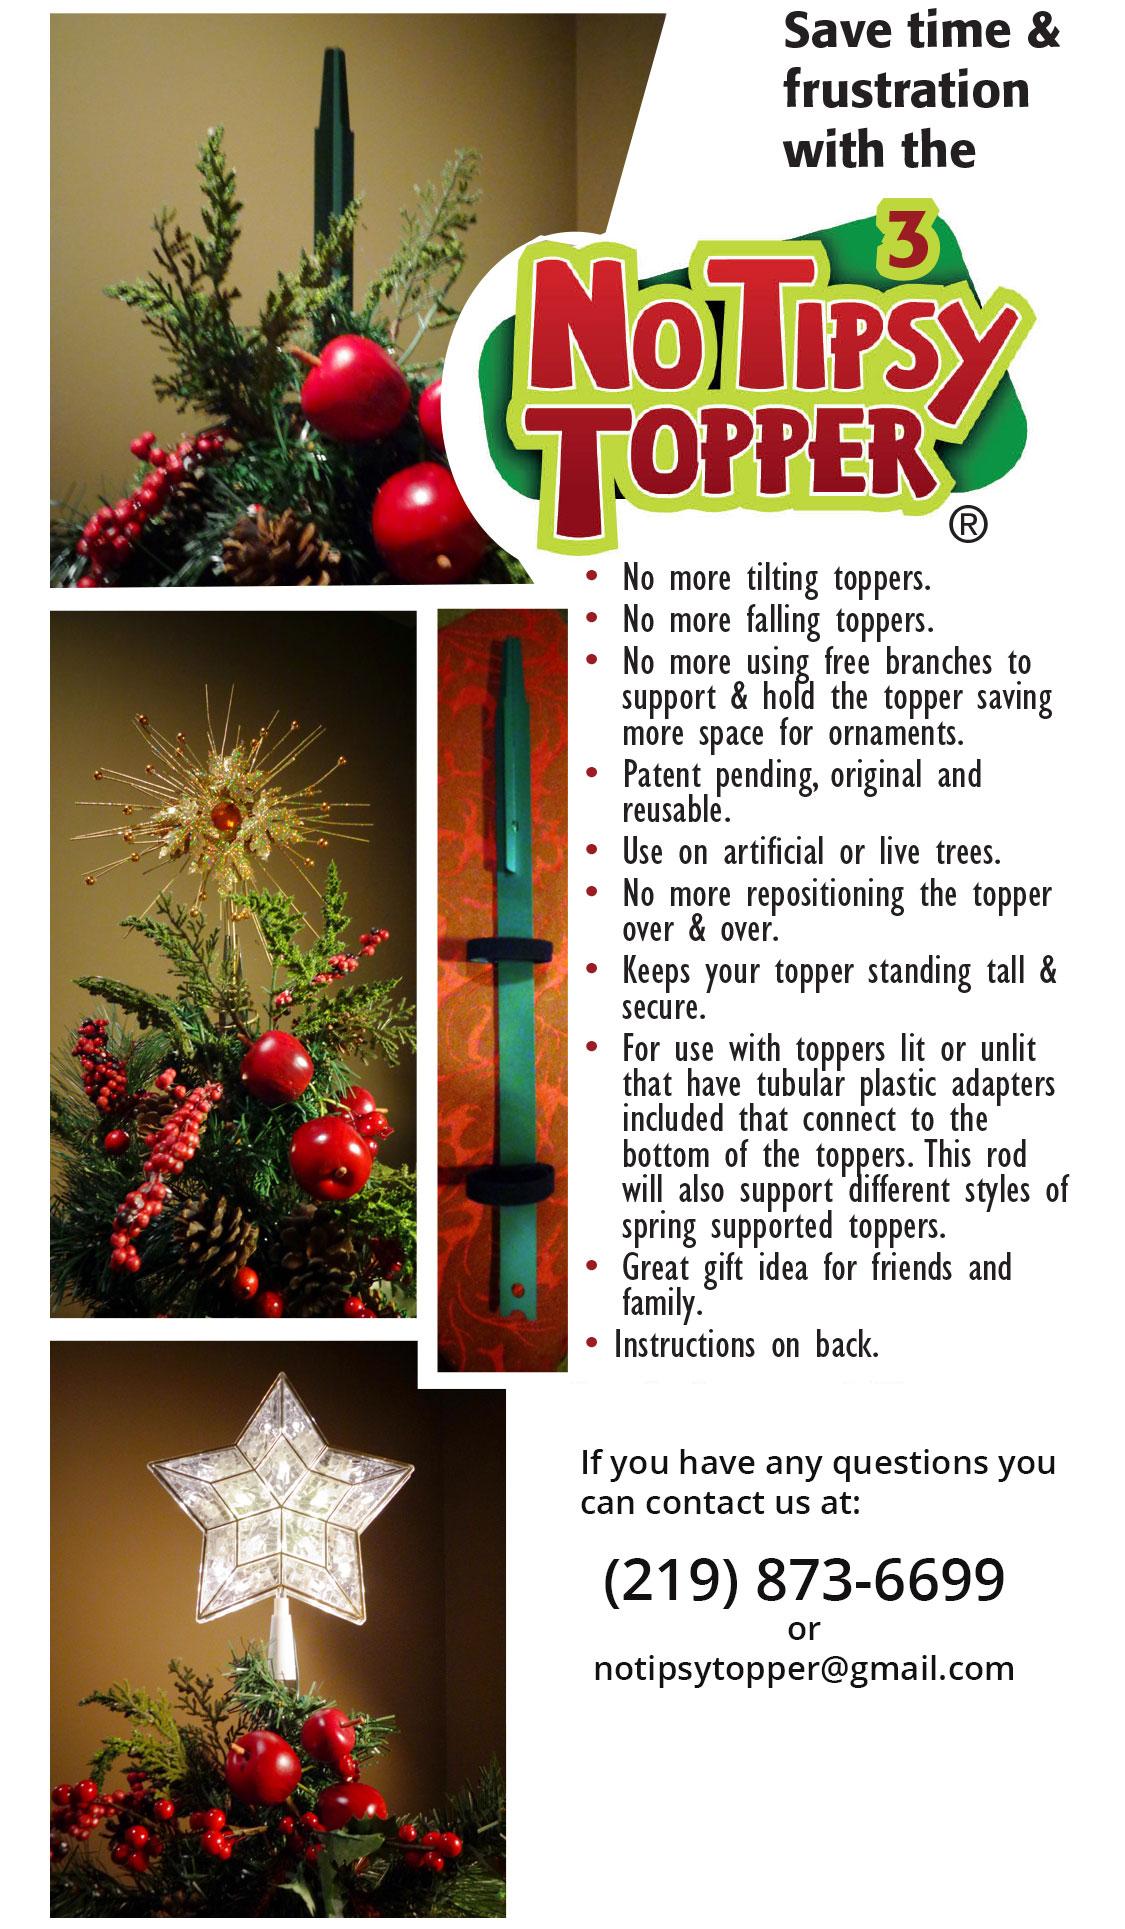 Steve Harvey Christmas Tree.Christmas Tree Topper Tipsy Topper Style 3 As Seen On